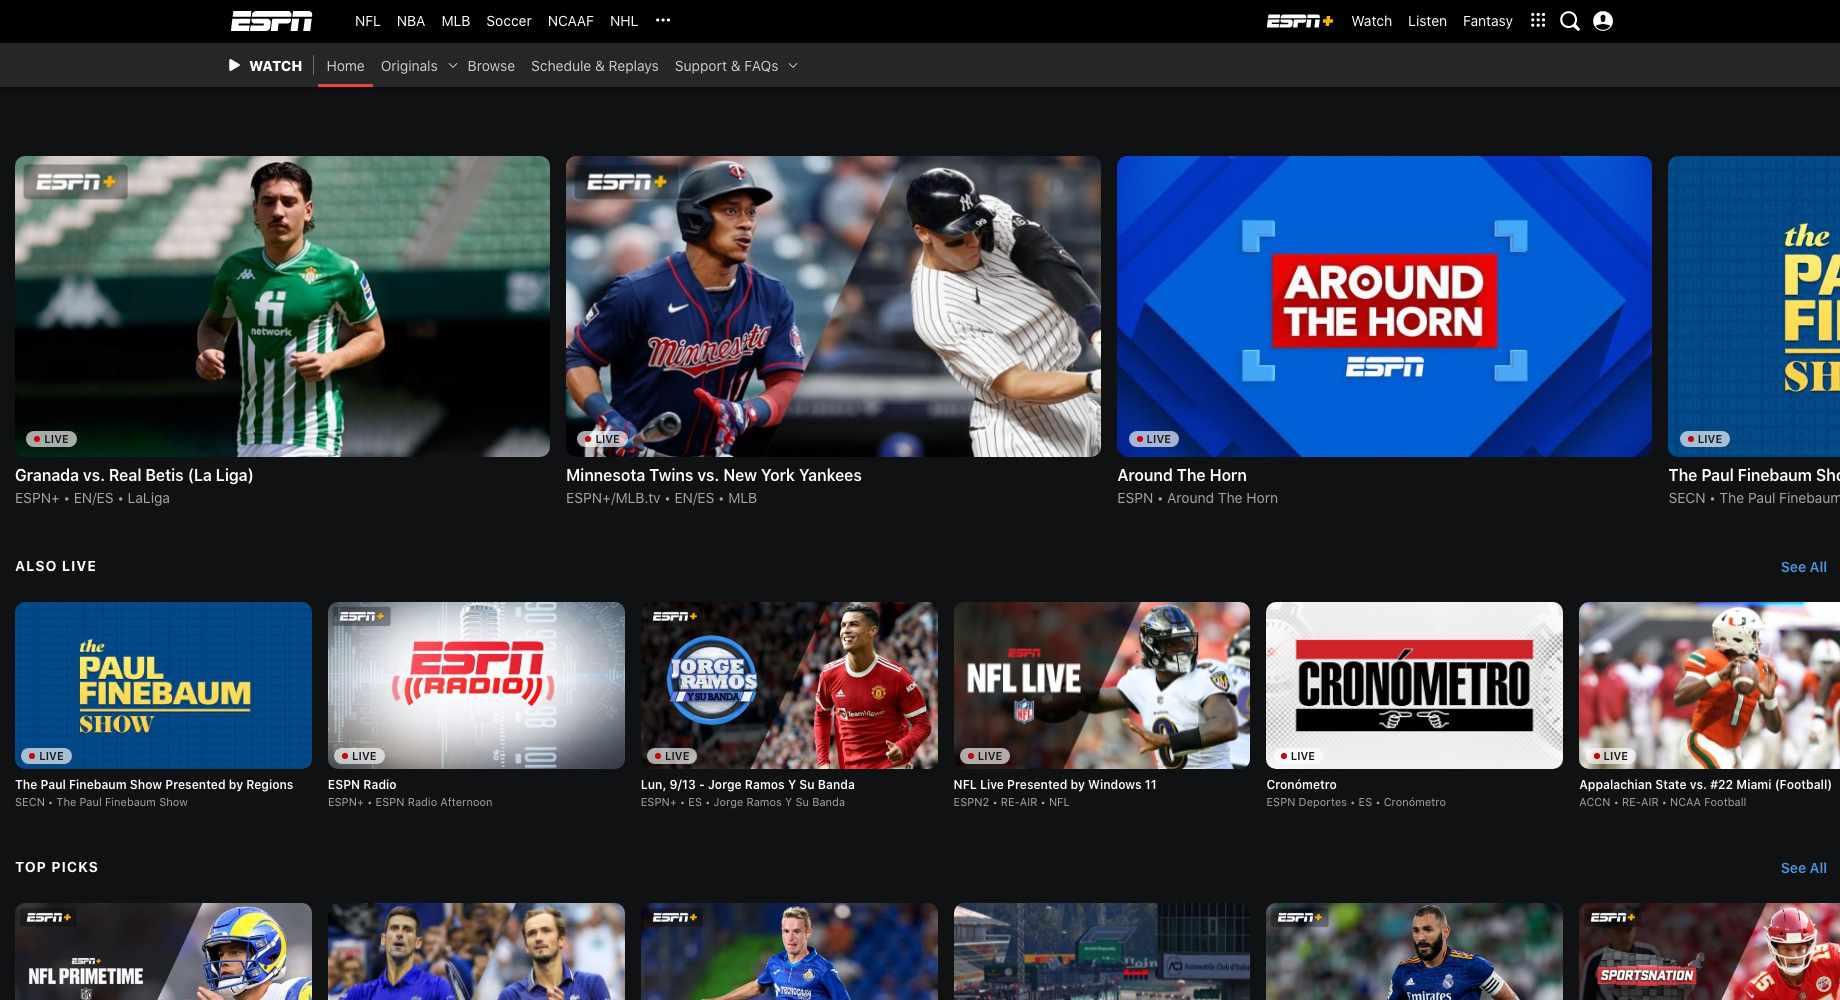 ESPN online